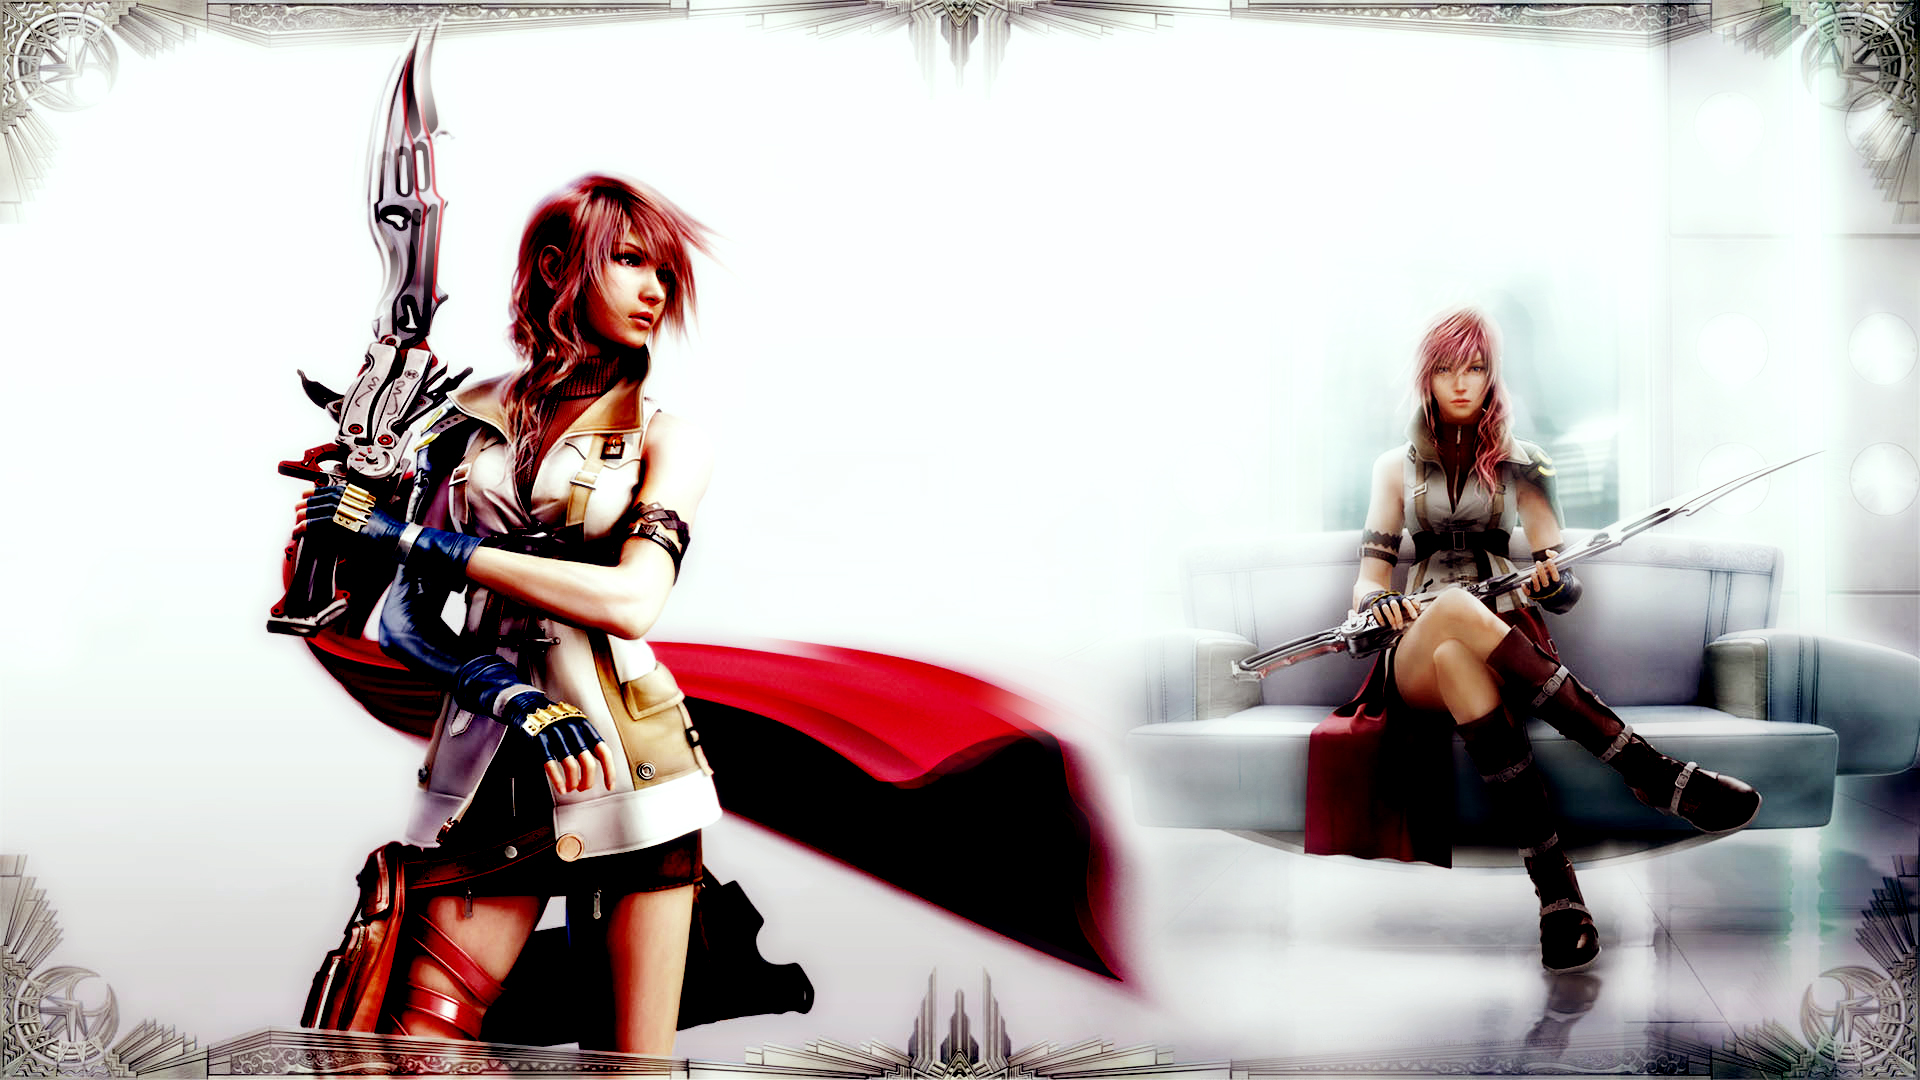 Final Fantasy Ps3 Backgrounds Full HD desktop wallpaper Wallinda 1920x1080